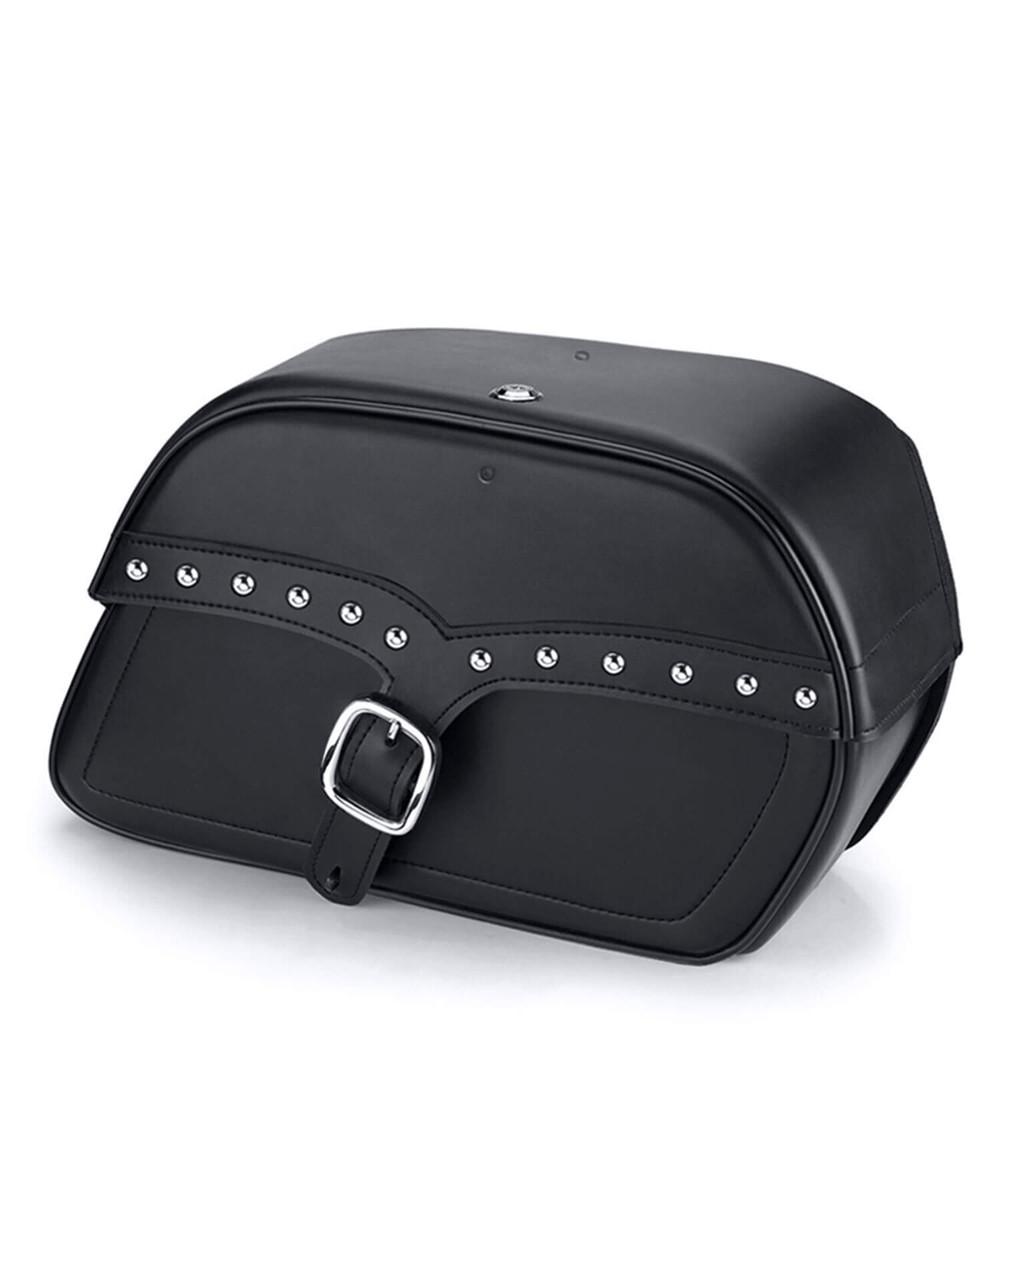 Suzuki Intruder 1500 VL1500 Charger Single Strap Studded Motorcycle Saddlebags Main Bag View